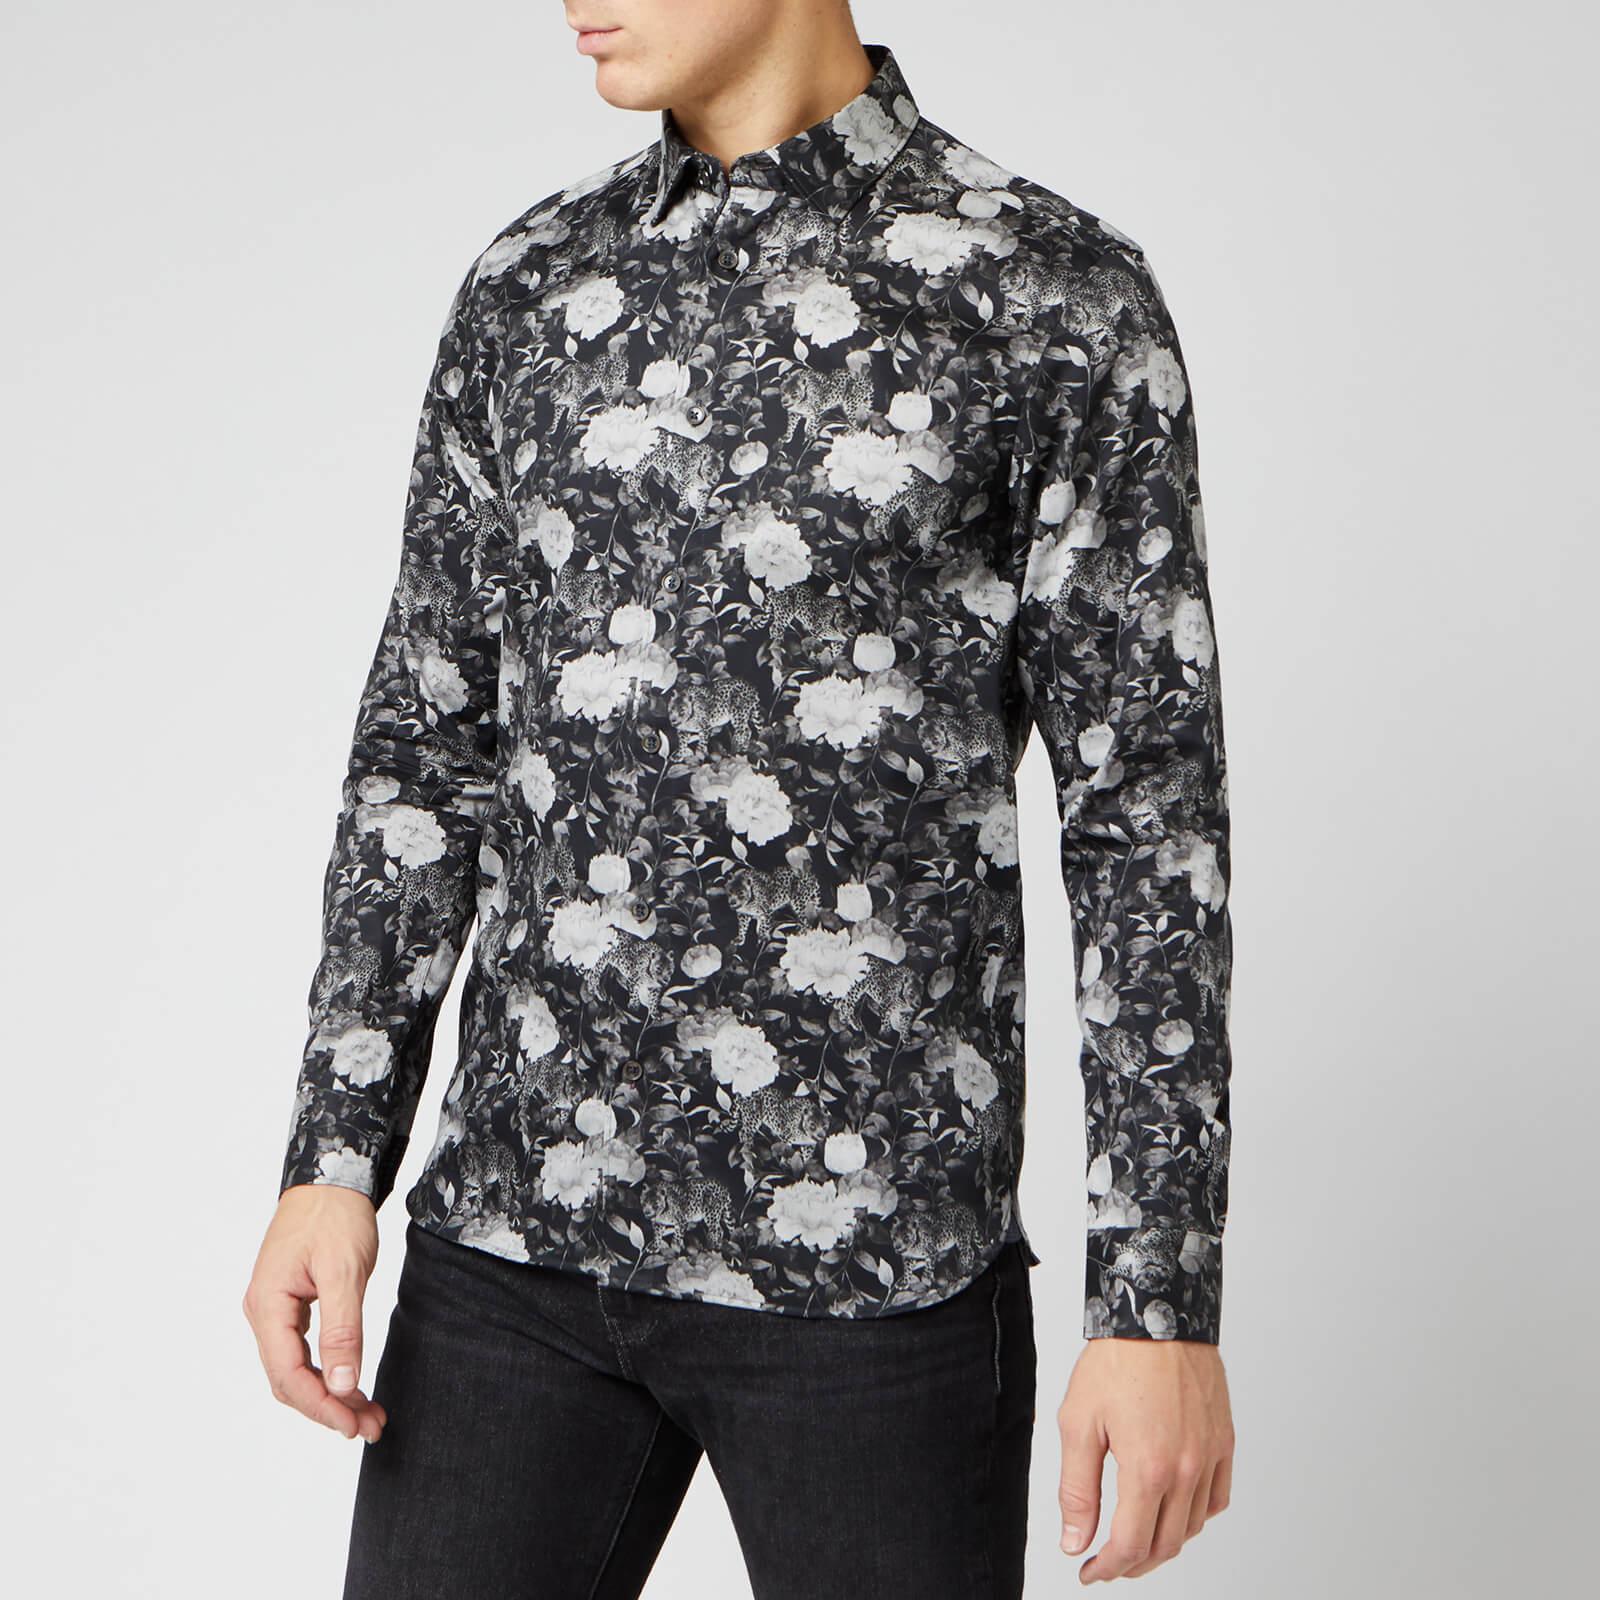 Ted Baker Men's Stylo Floral Shirt - Black - S/2